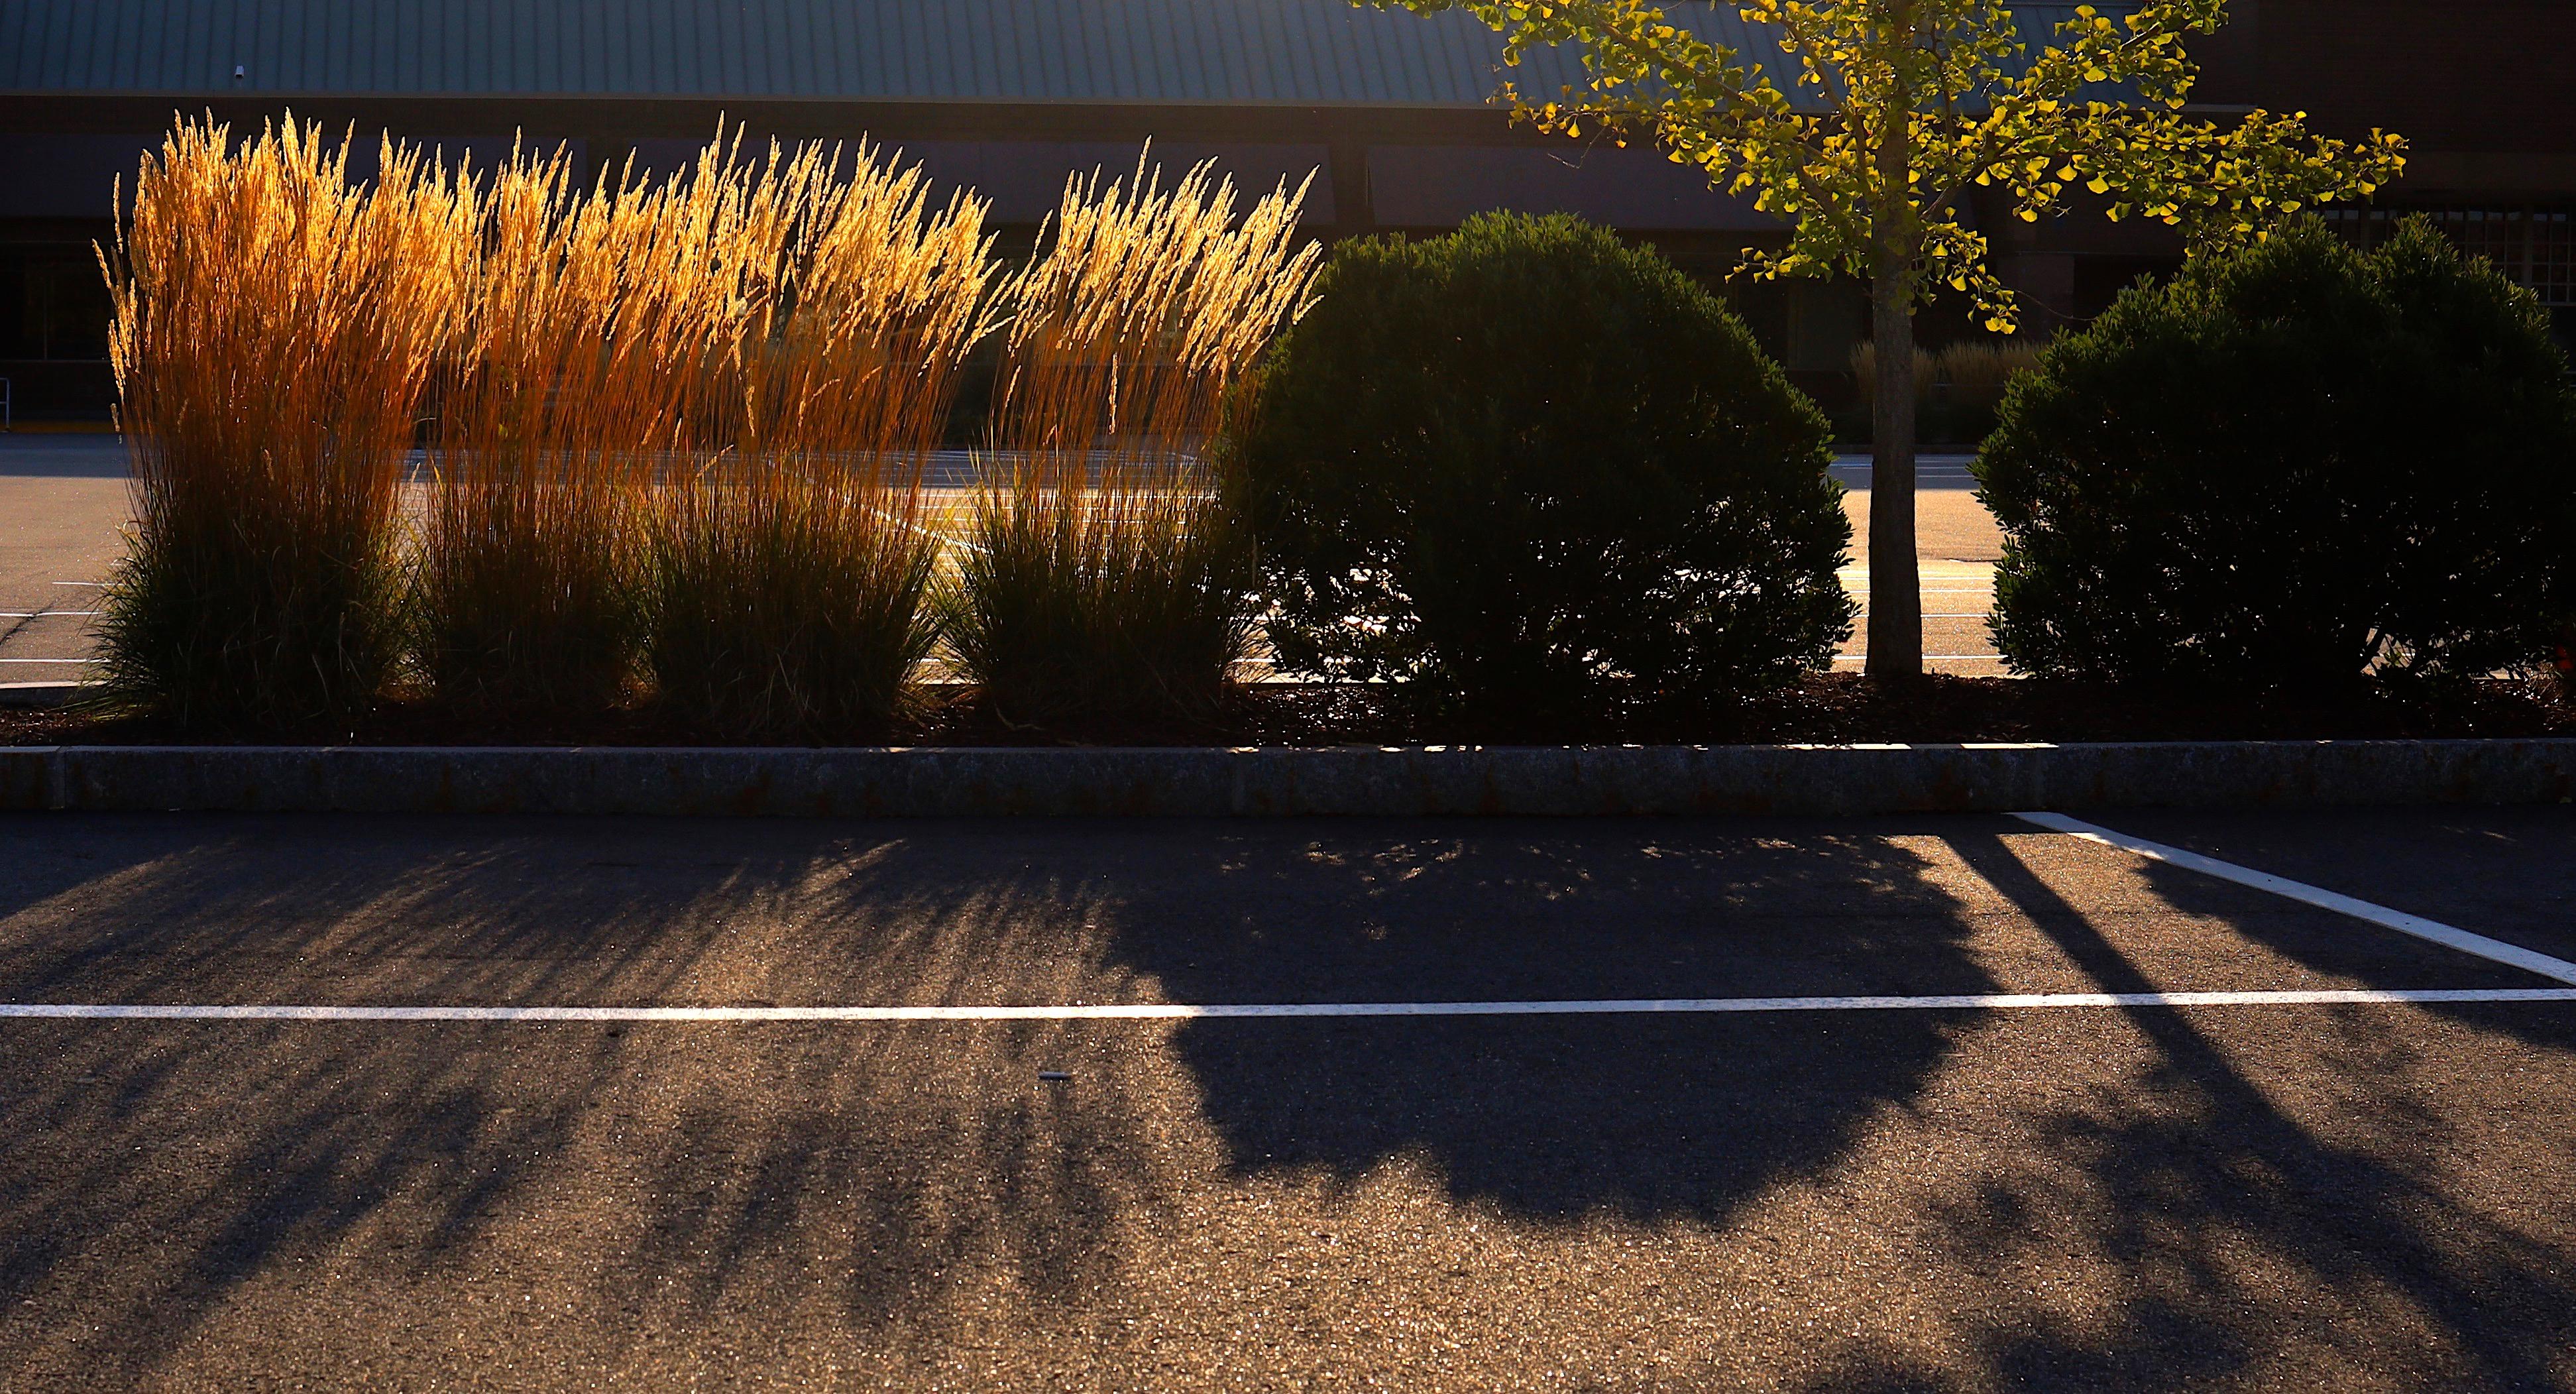 fall parking lot 2